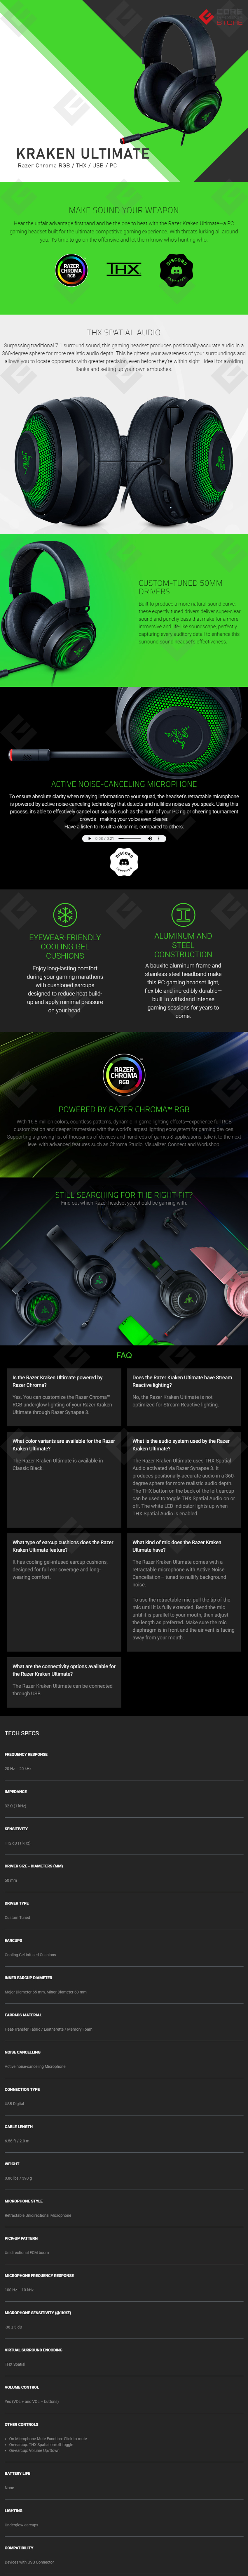 Diadema Gamer Razer Kraken Ultimate, Alambrico, Active Noise-Canceling, THX Supported, Razer Chroma RGB, USB, PC - RZ04-03180100-R3U1